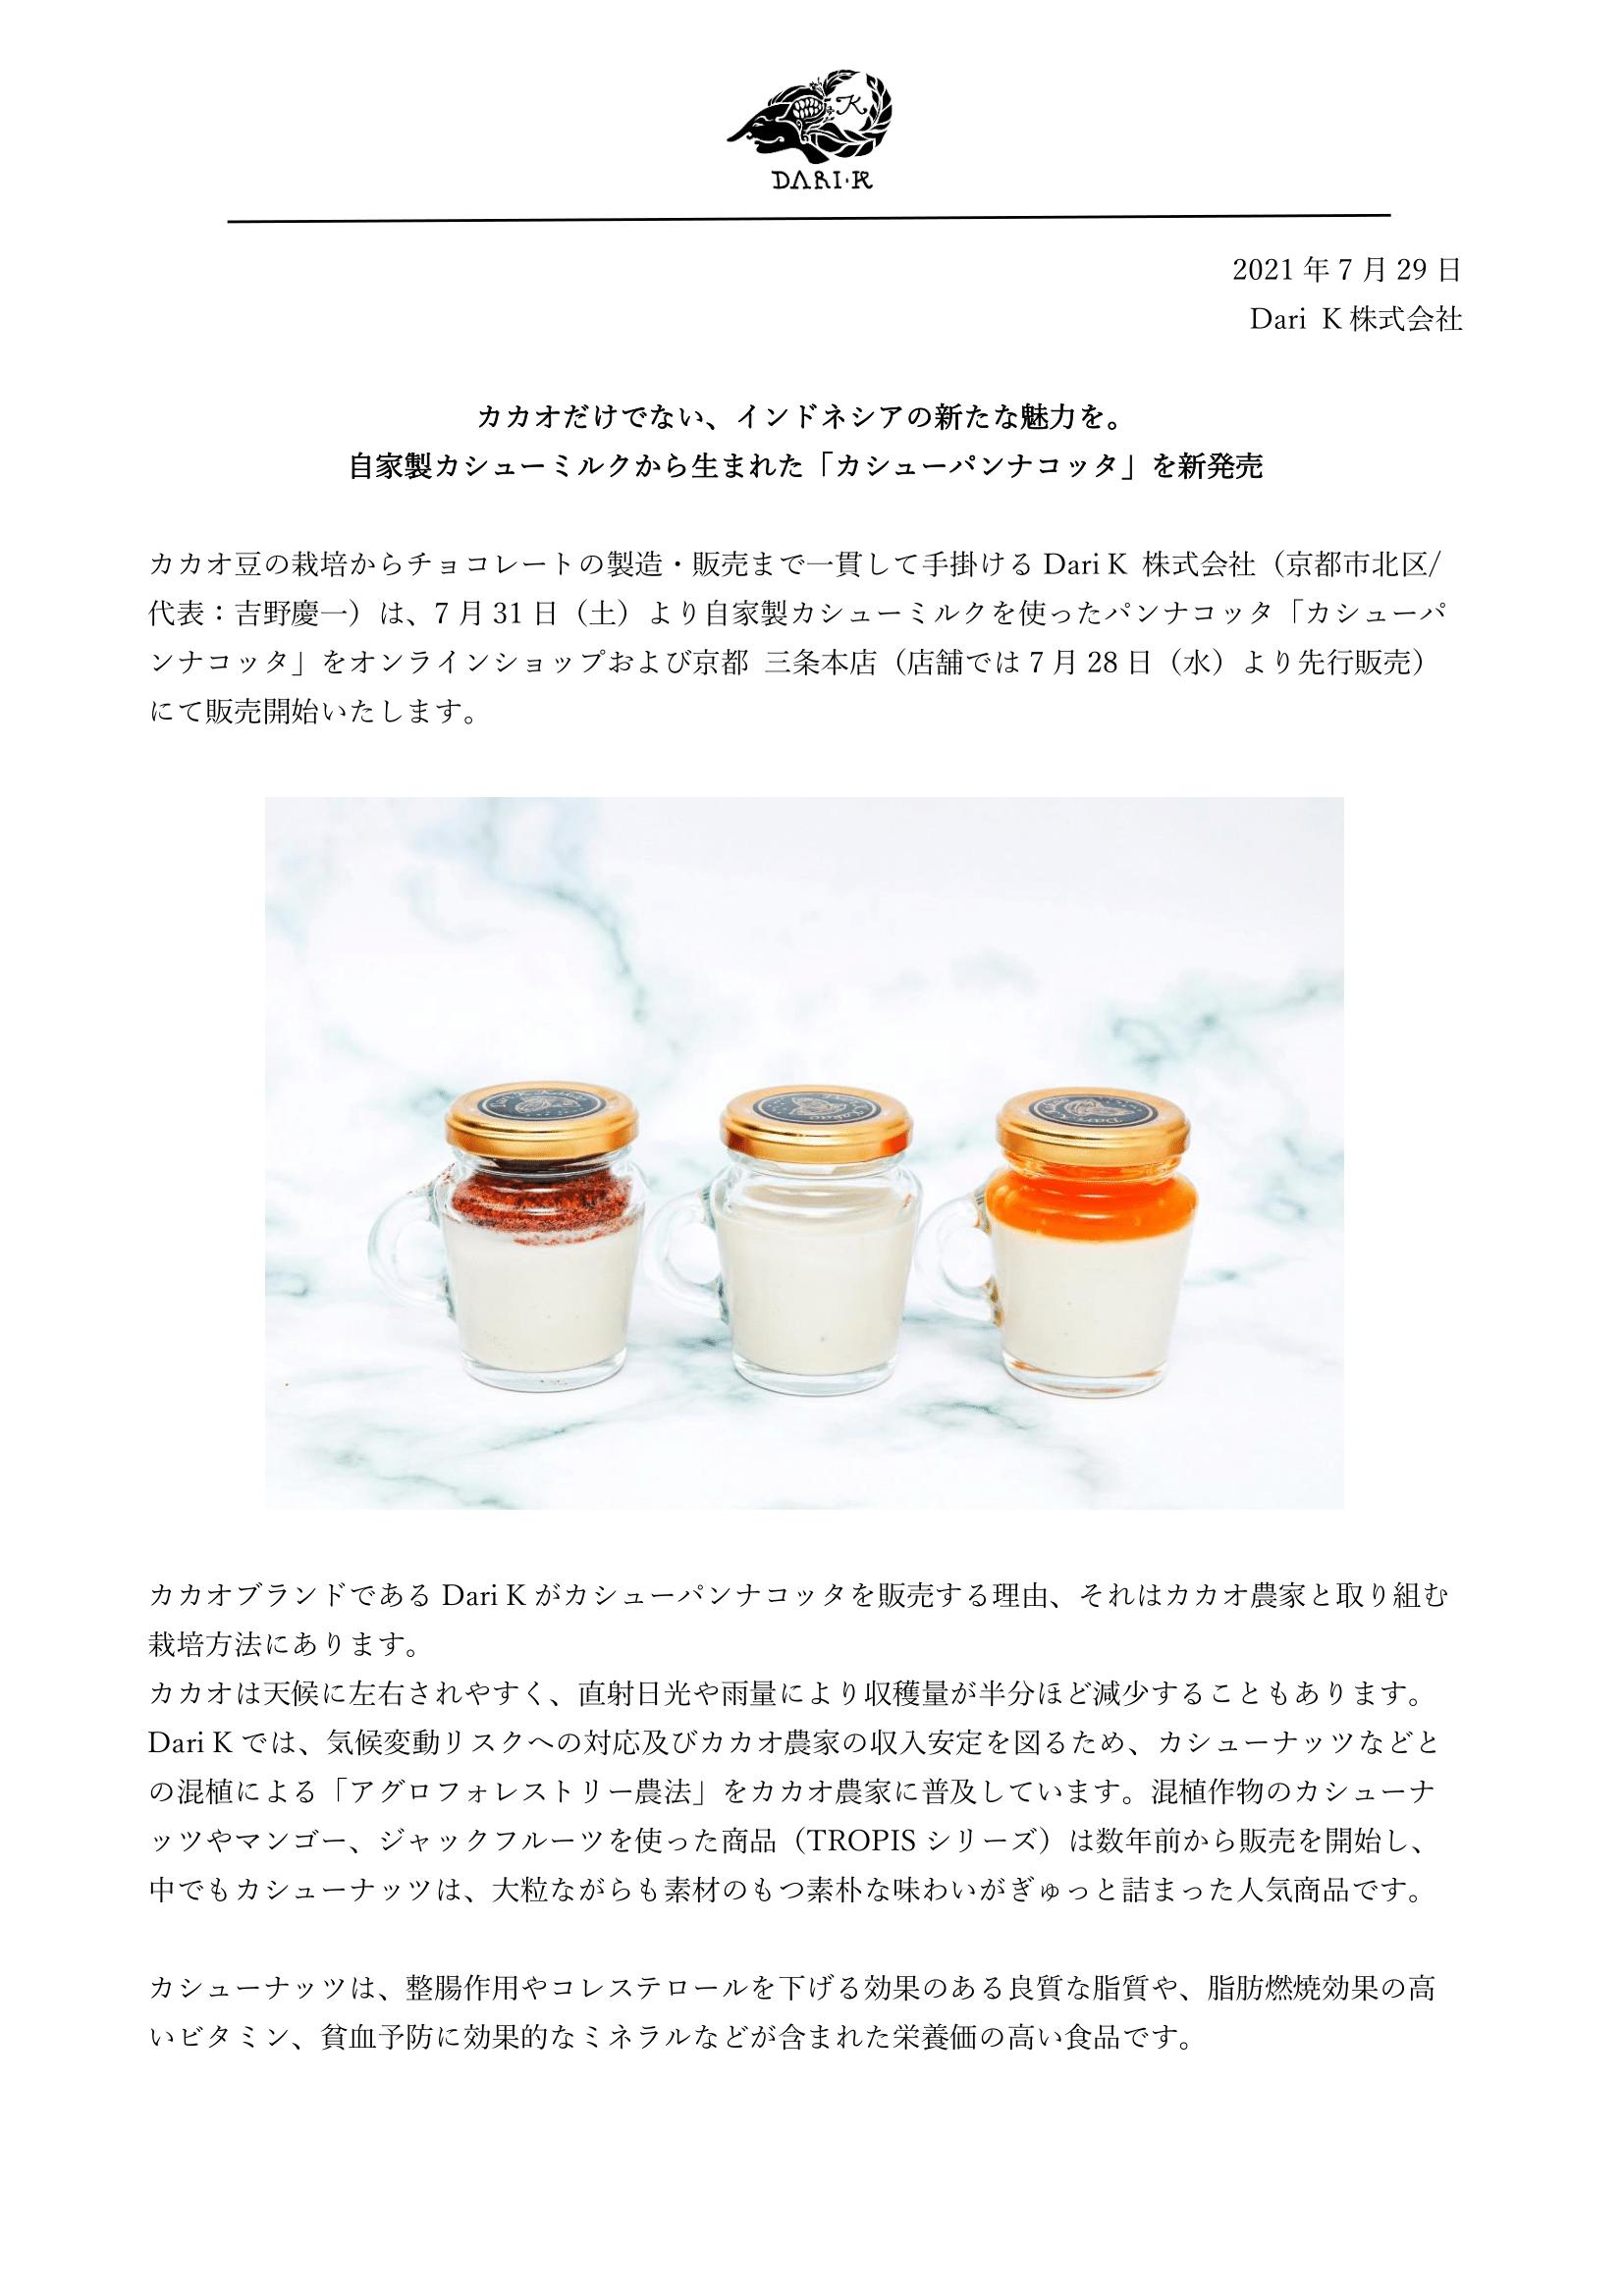 Dari K 「カシューパンナコッタ」プレスリリース(2021年7月29日)-1